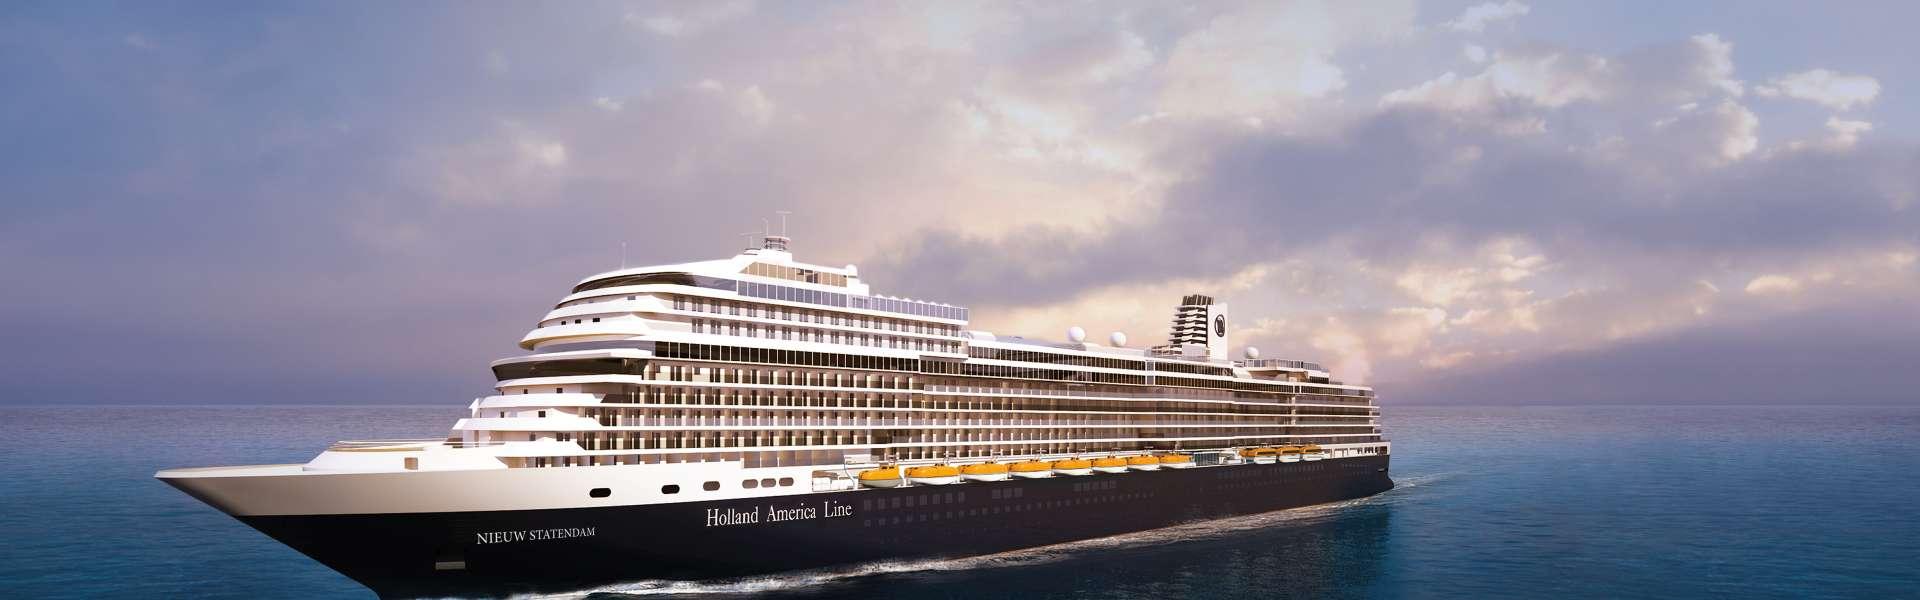 Croaziera 2019 - Caraibe de Vest (Fort Lauderdale) - Holland America Line - Nieuw Statendam - 7 nopti